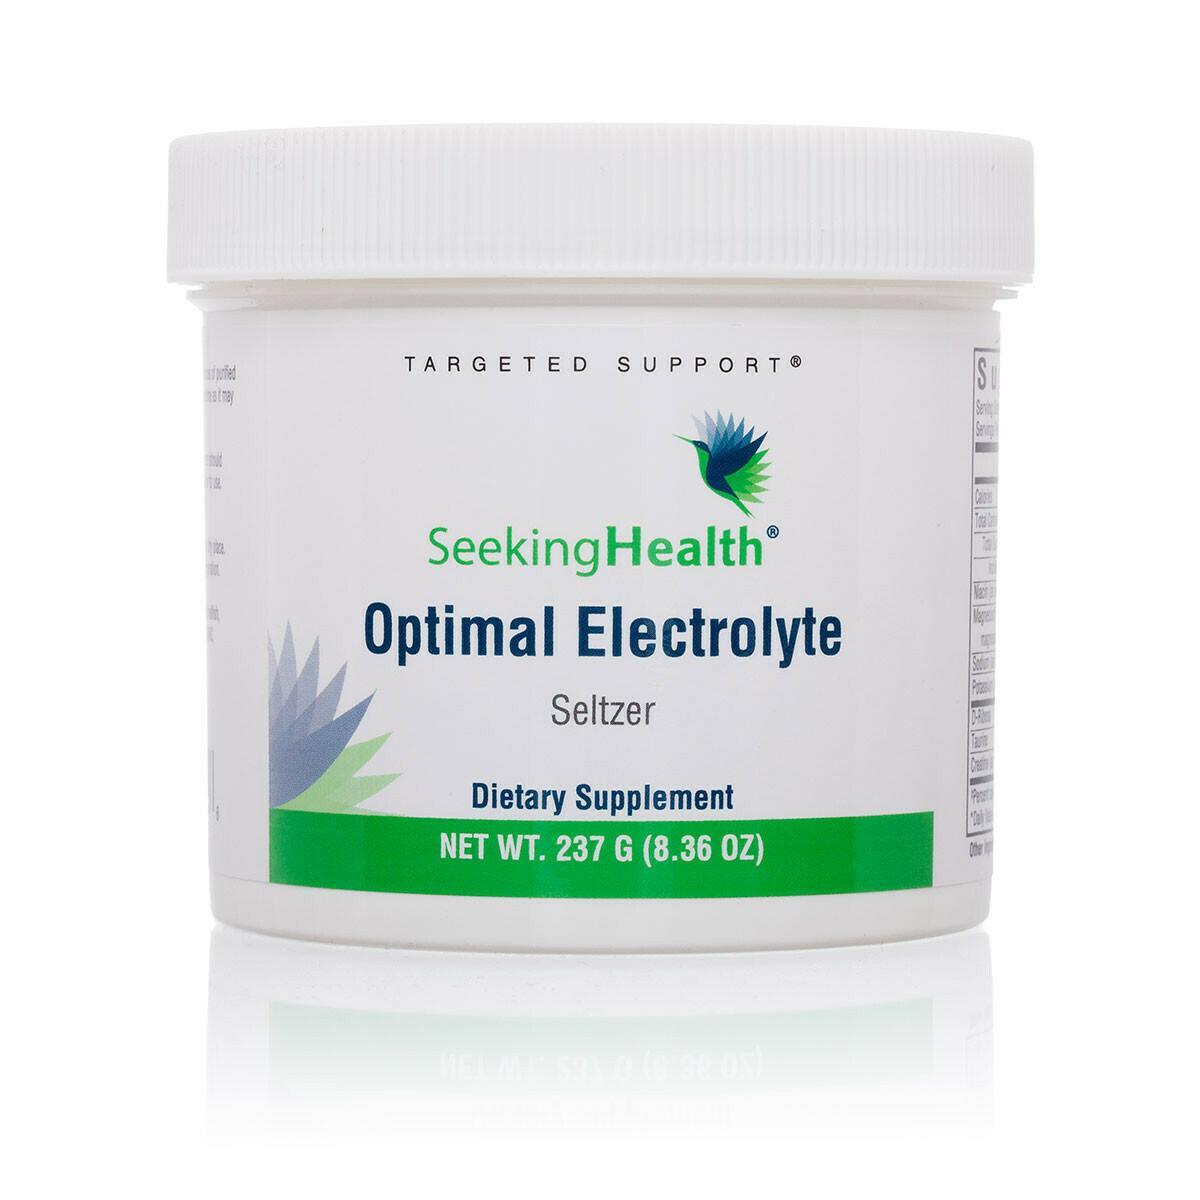 OPTIMAL ELECTROLYTE SELTZER - 30 SERVINGS